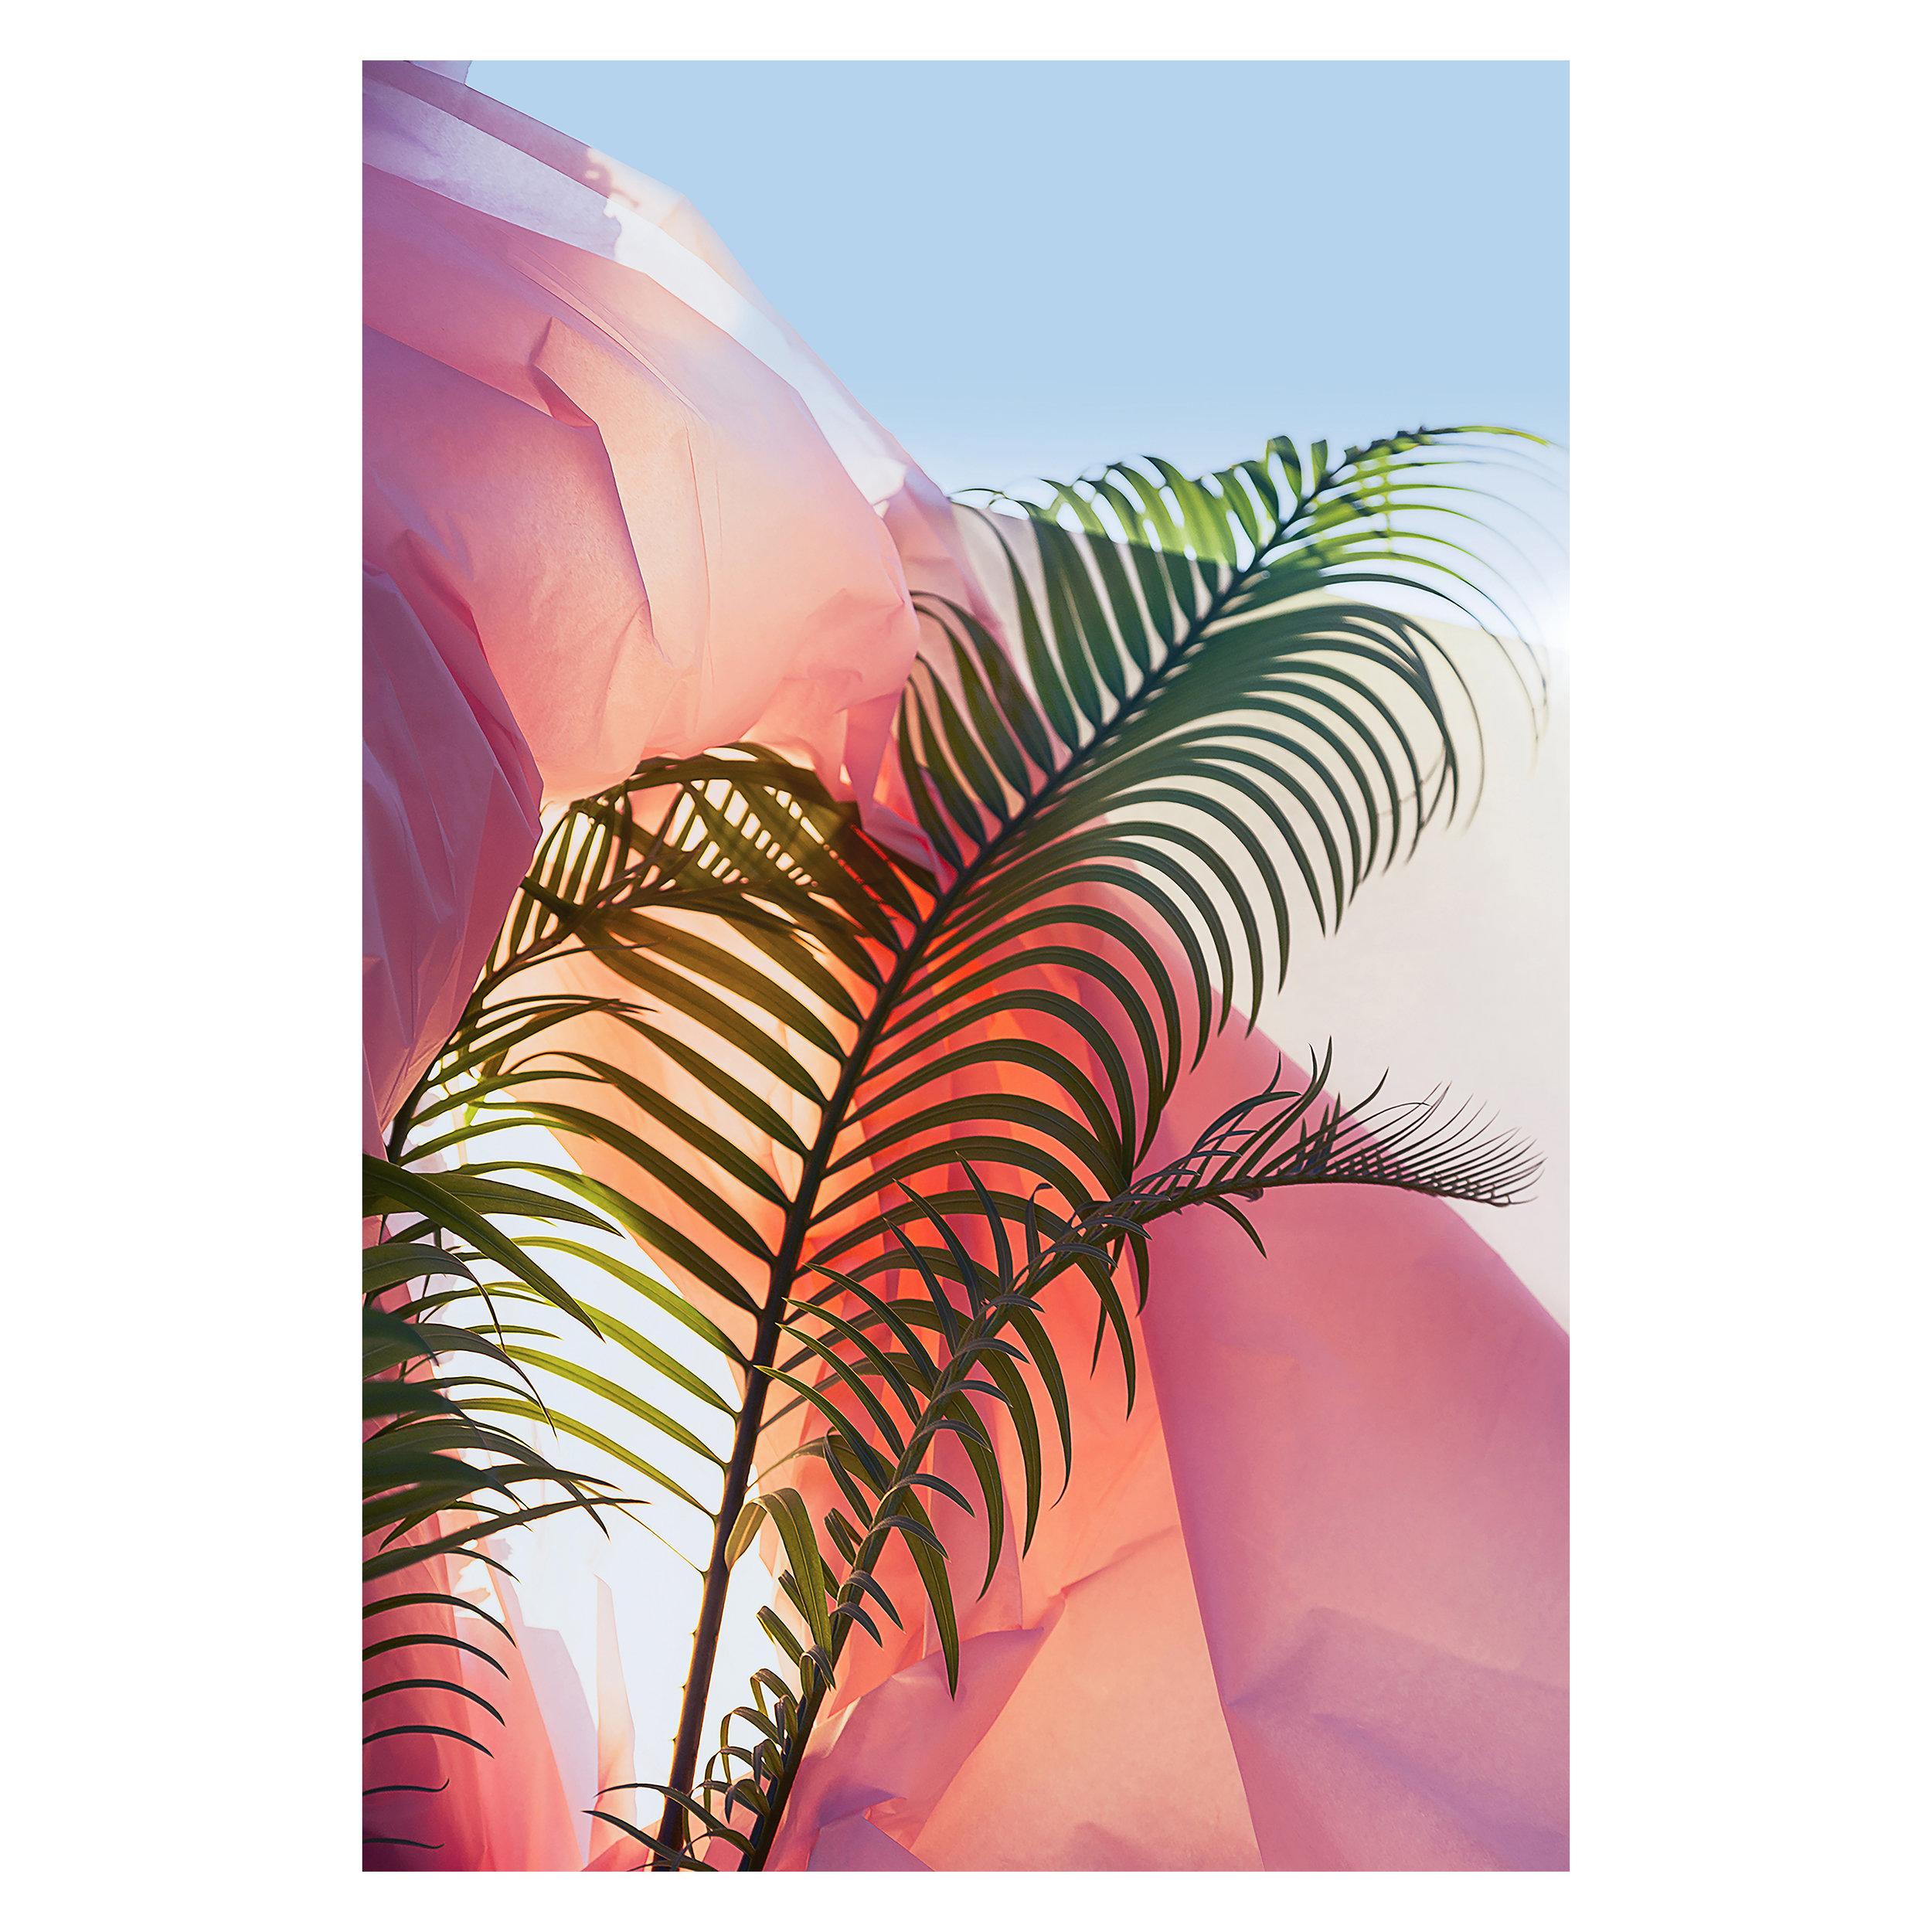 "Palm on Plastic: La Habra, California  Lightjet Kodak Endura C-Print, 30.0"" x 20.0""  Signed, 2017  Edition of Five + 1 Artist Proof"